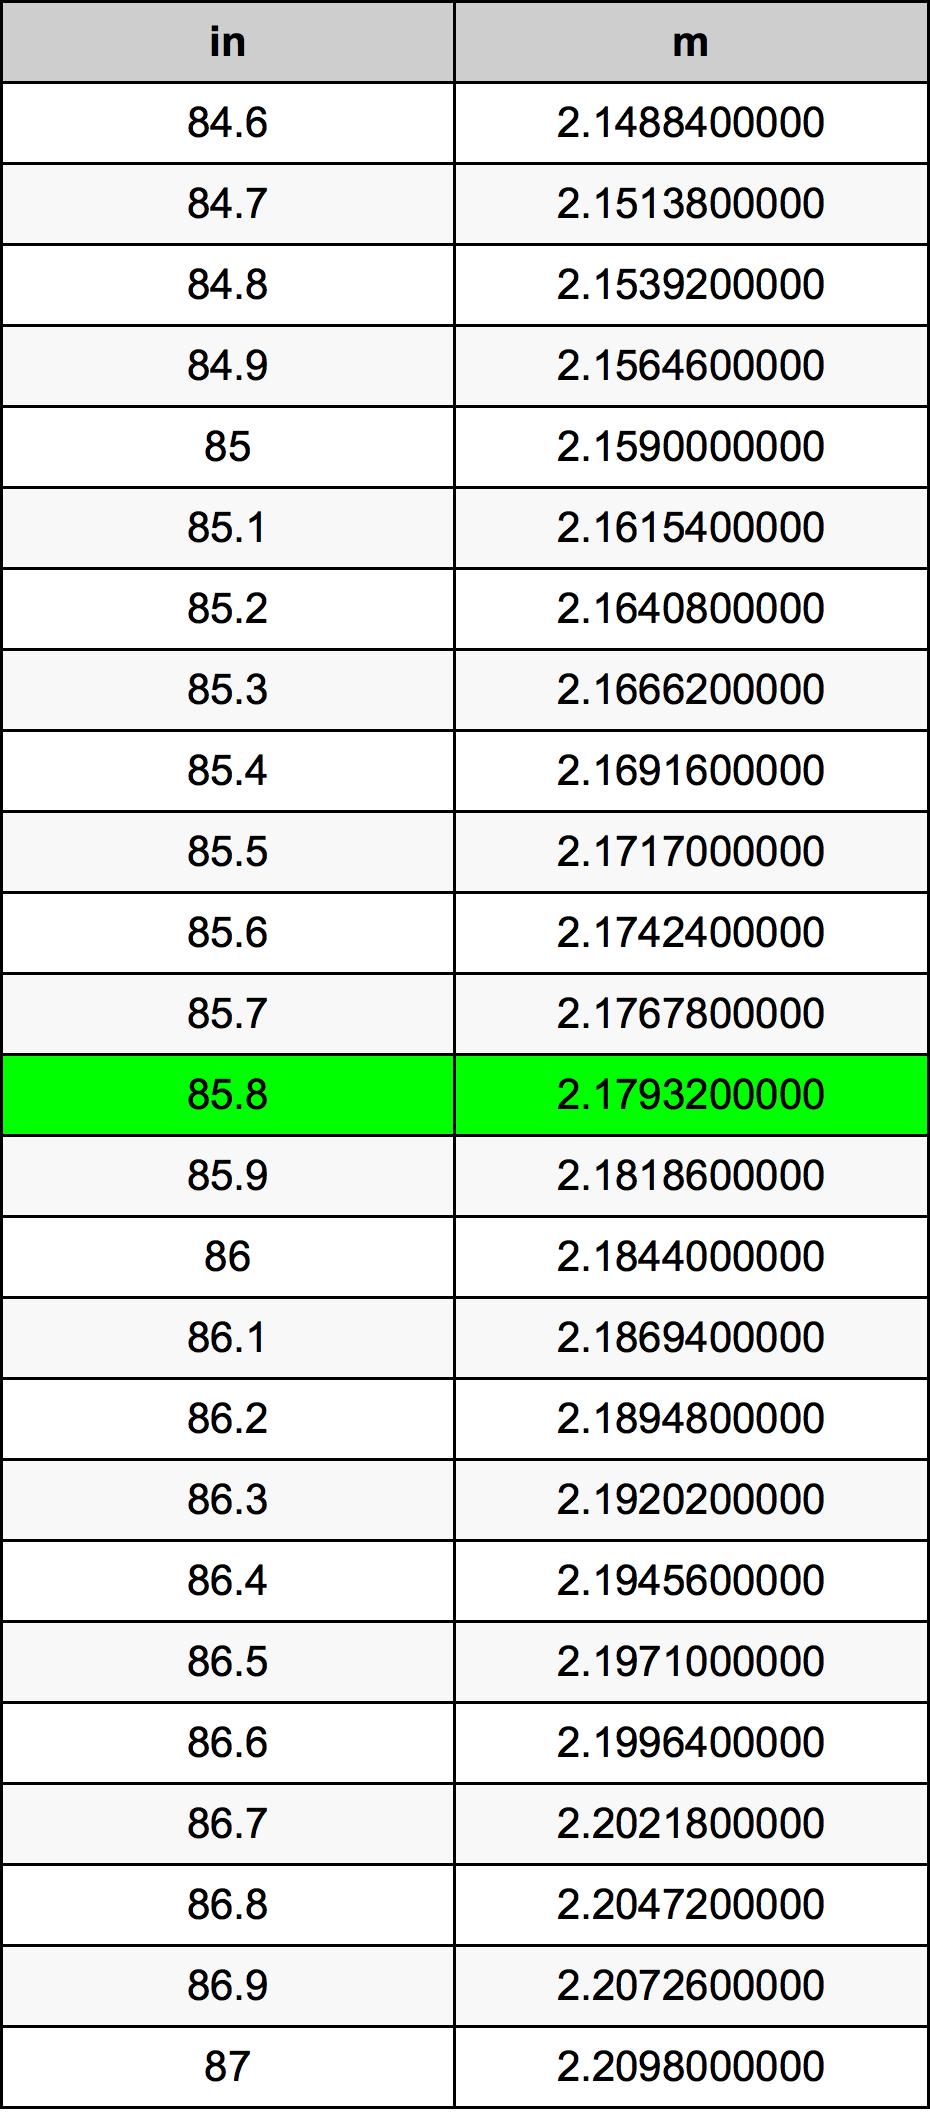 85.8 इंच रूपांतरण सारणी